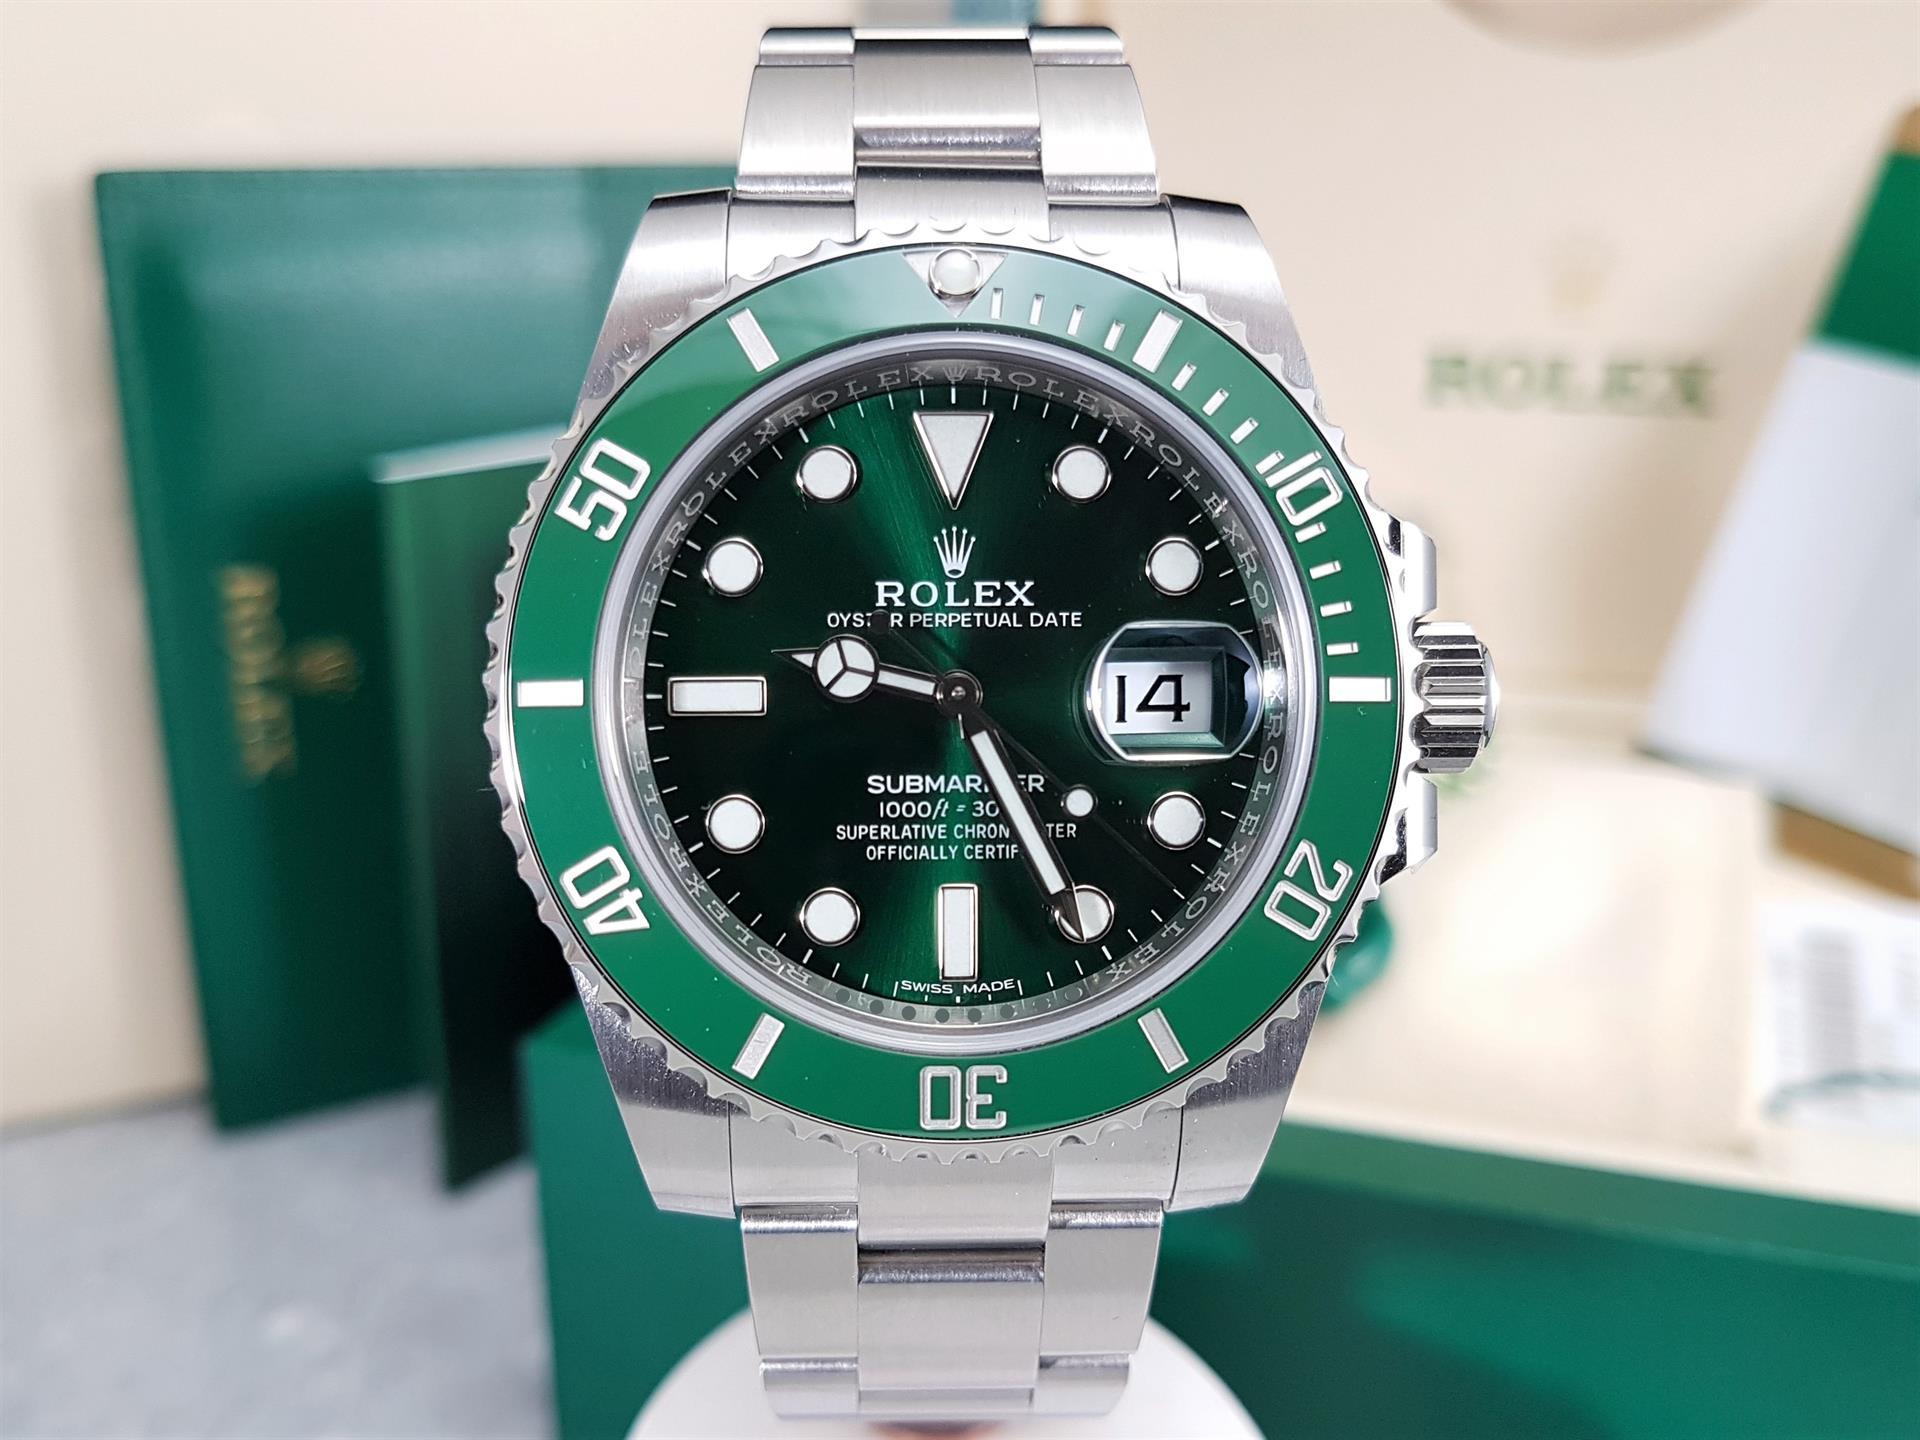 Rolex Submariner Date 116610lv Hulk Green Bezel Dial